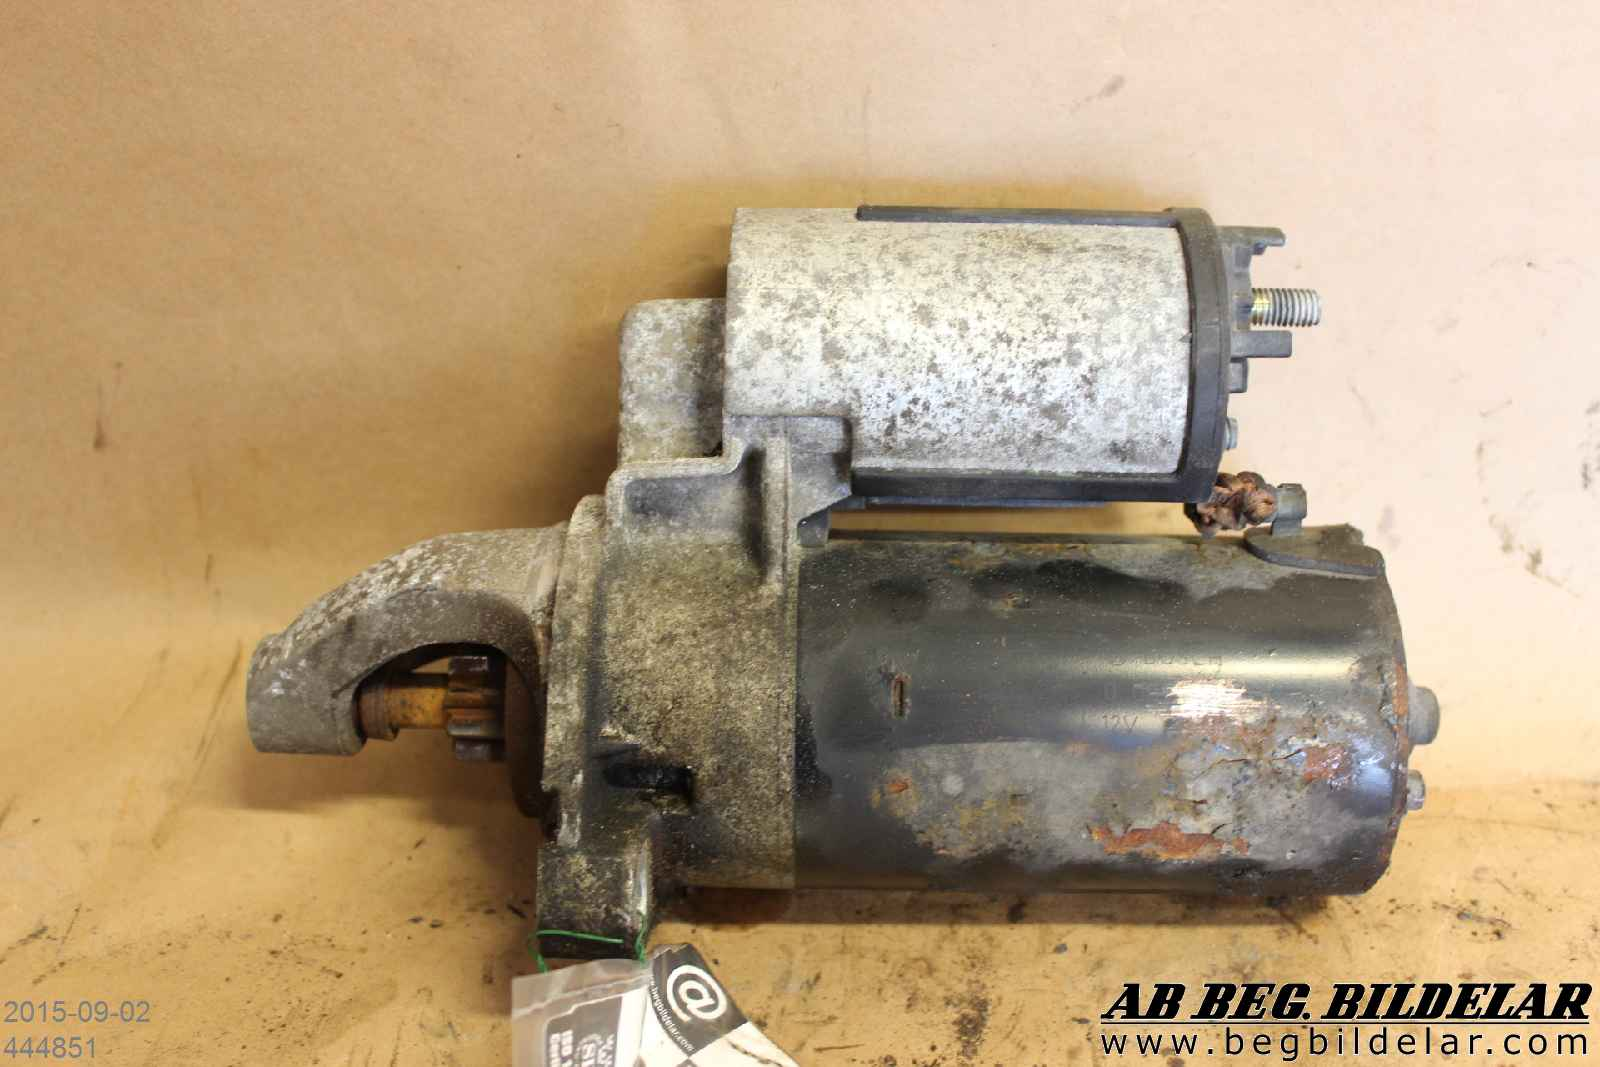 Startmotor till AUDI A6/S6 1995-1997 LN 0001108113 (0)